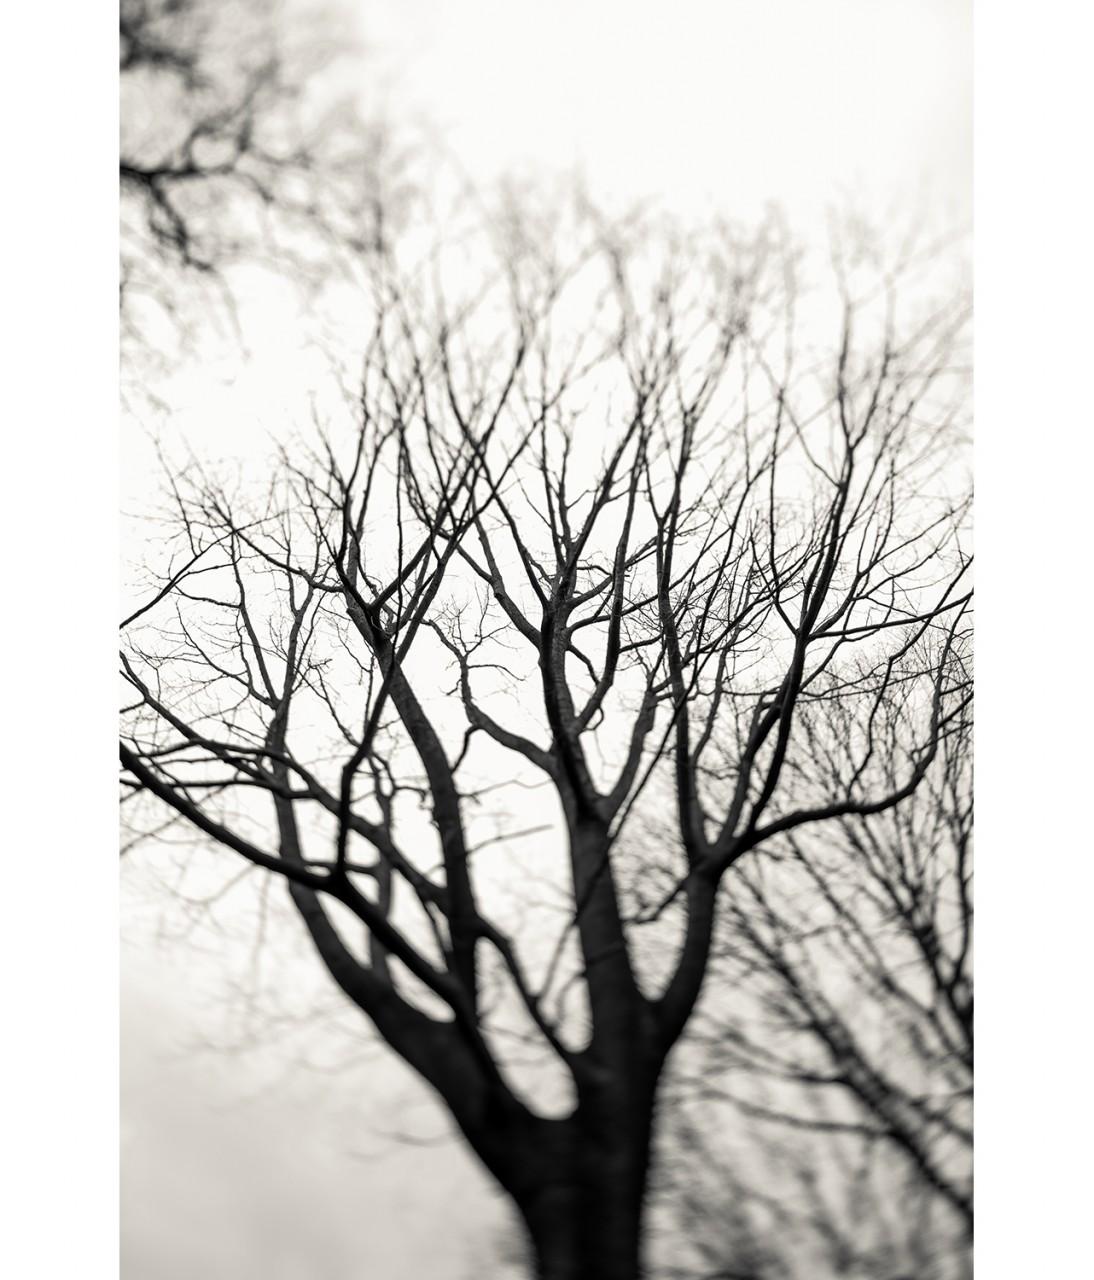 28_Untitled 1393